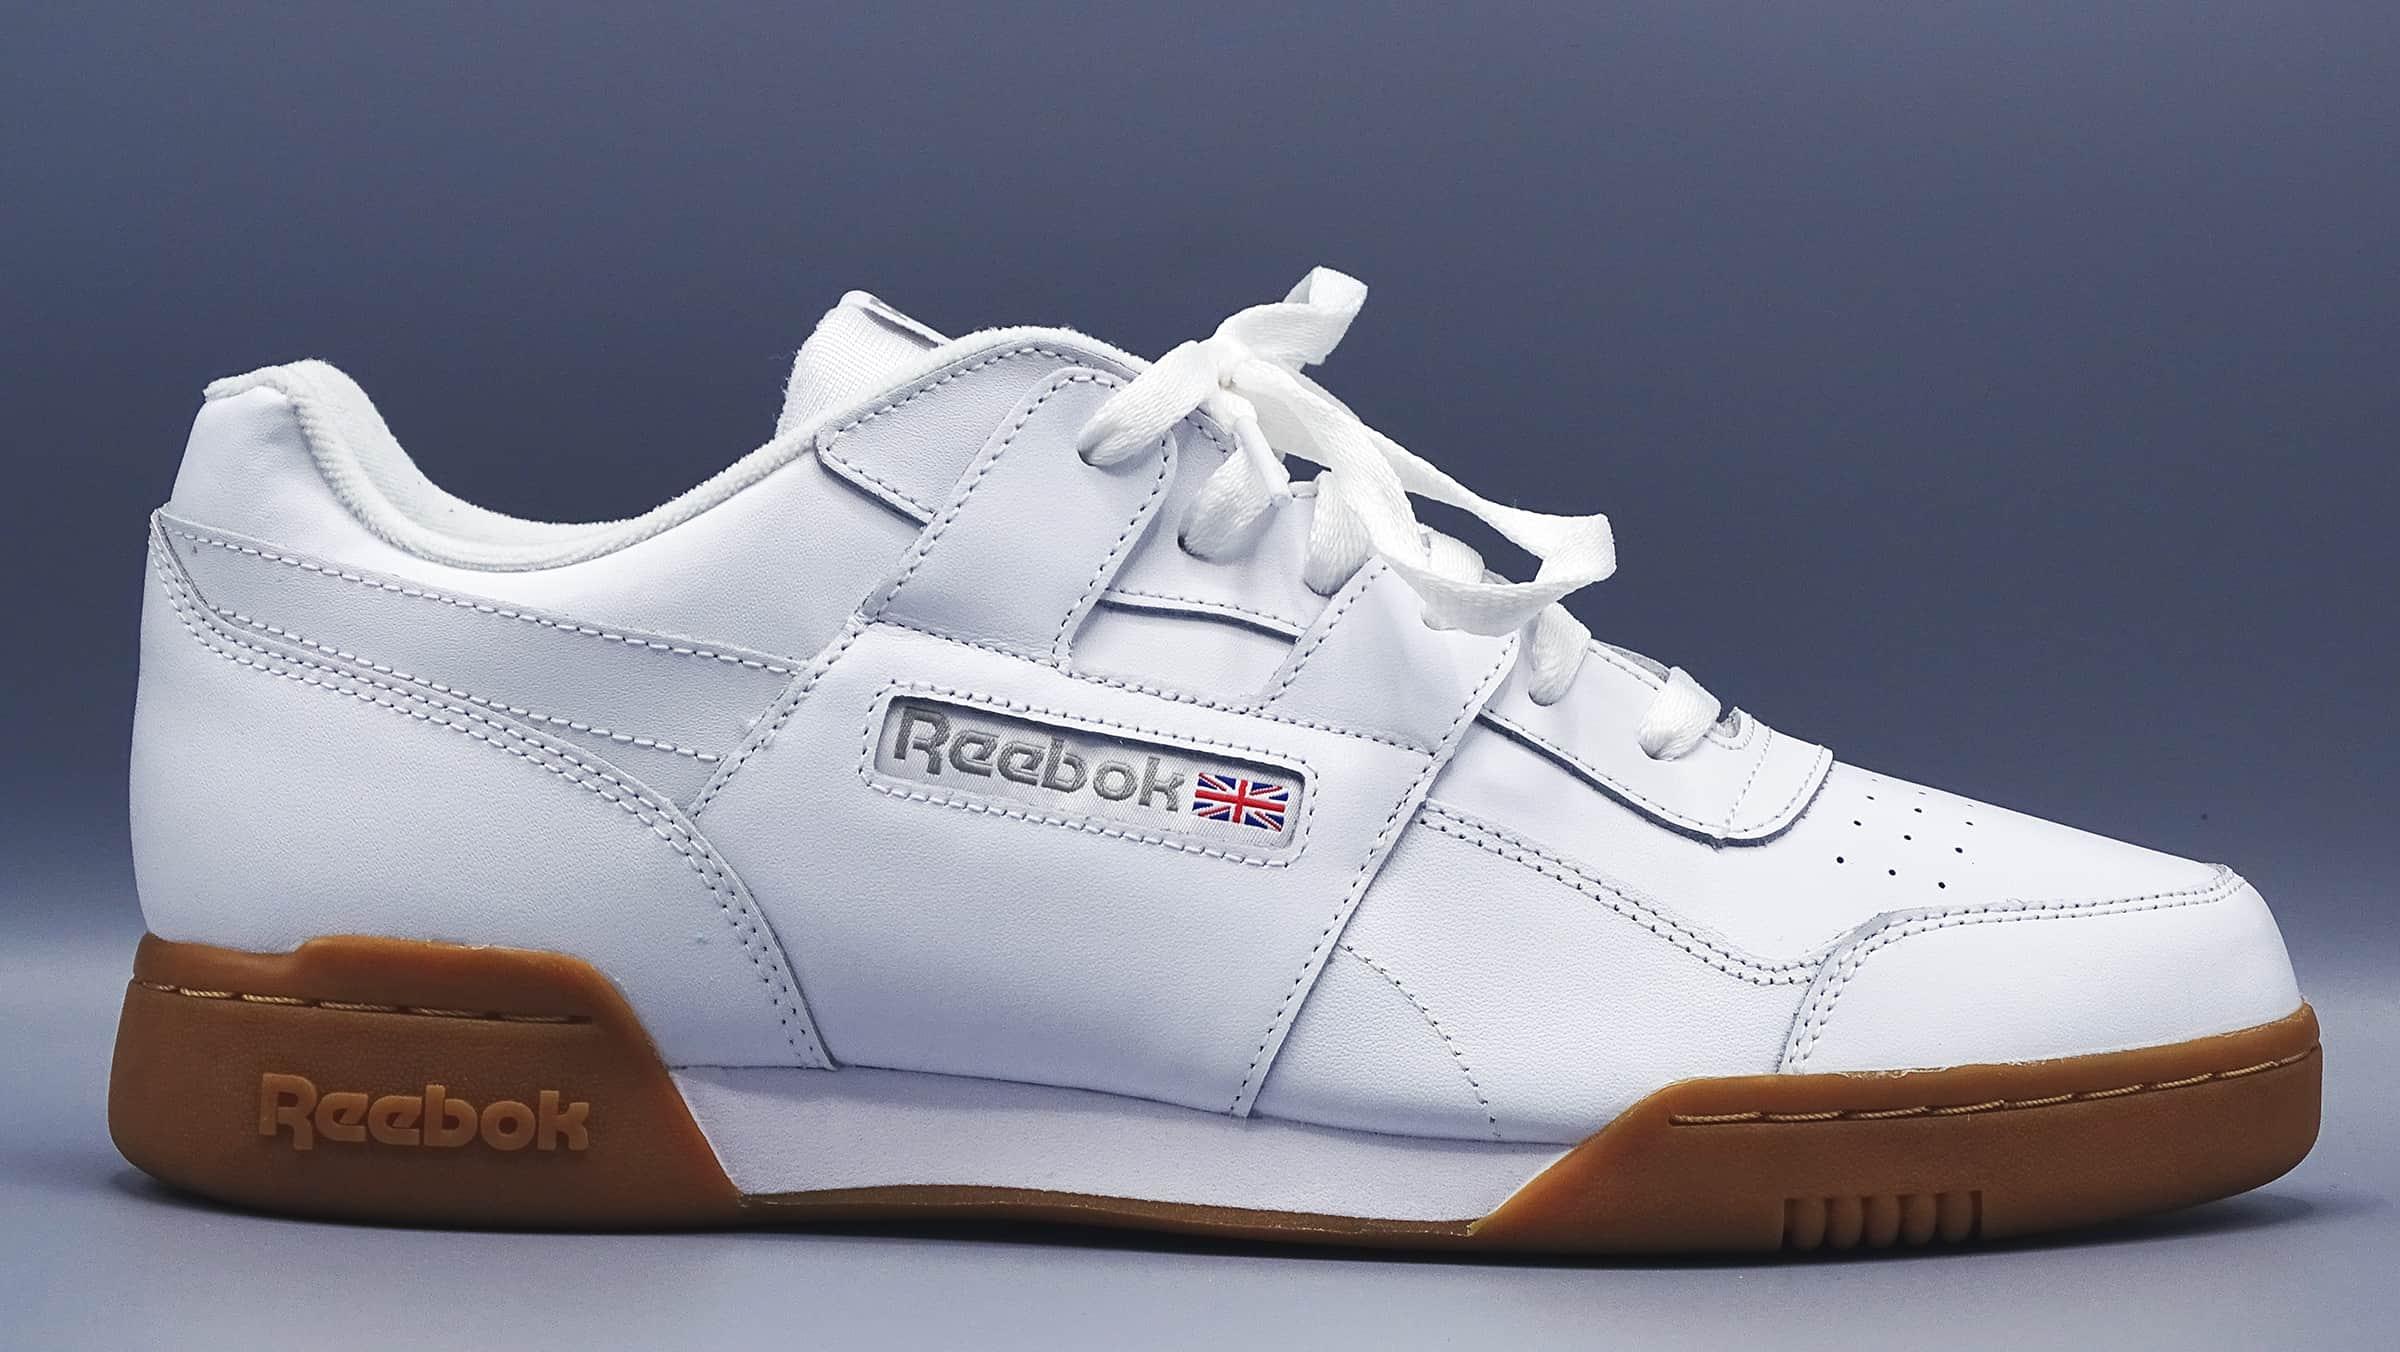 White men's reebok sneaker with gum colored bottom